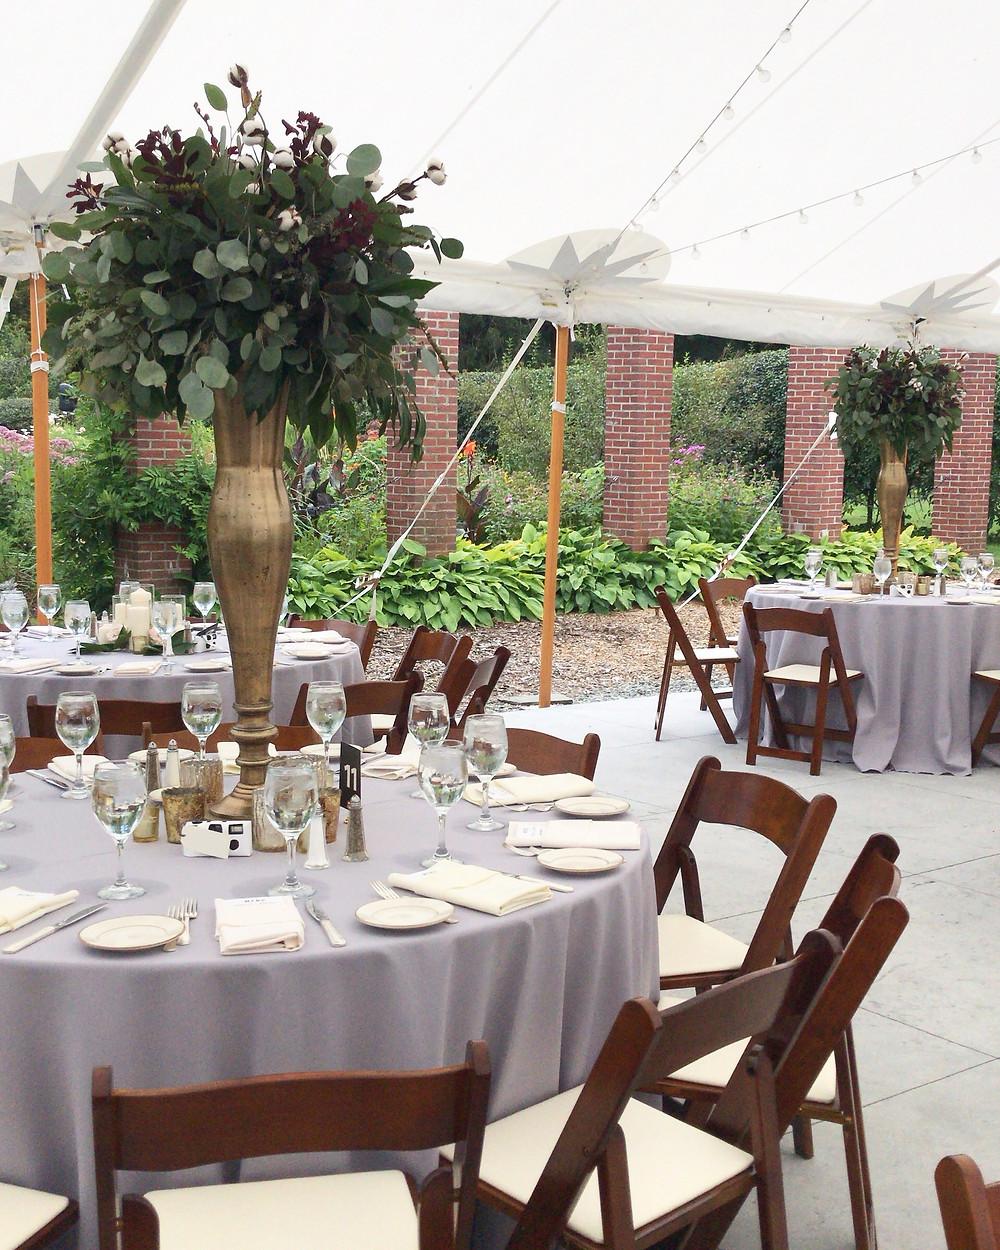 Glen Magna Tent, Glen Magna Wedding Flowers, Glen Magna chairs, Glen Magna Florist, Fleur + Stitch, Fleur & Stitch, Fleur and Stitch